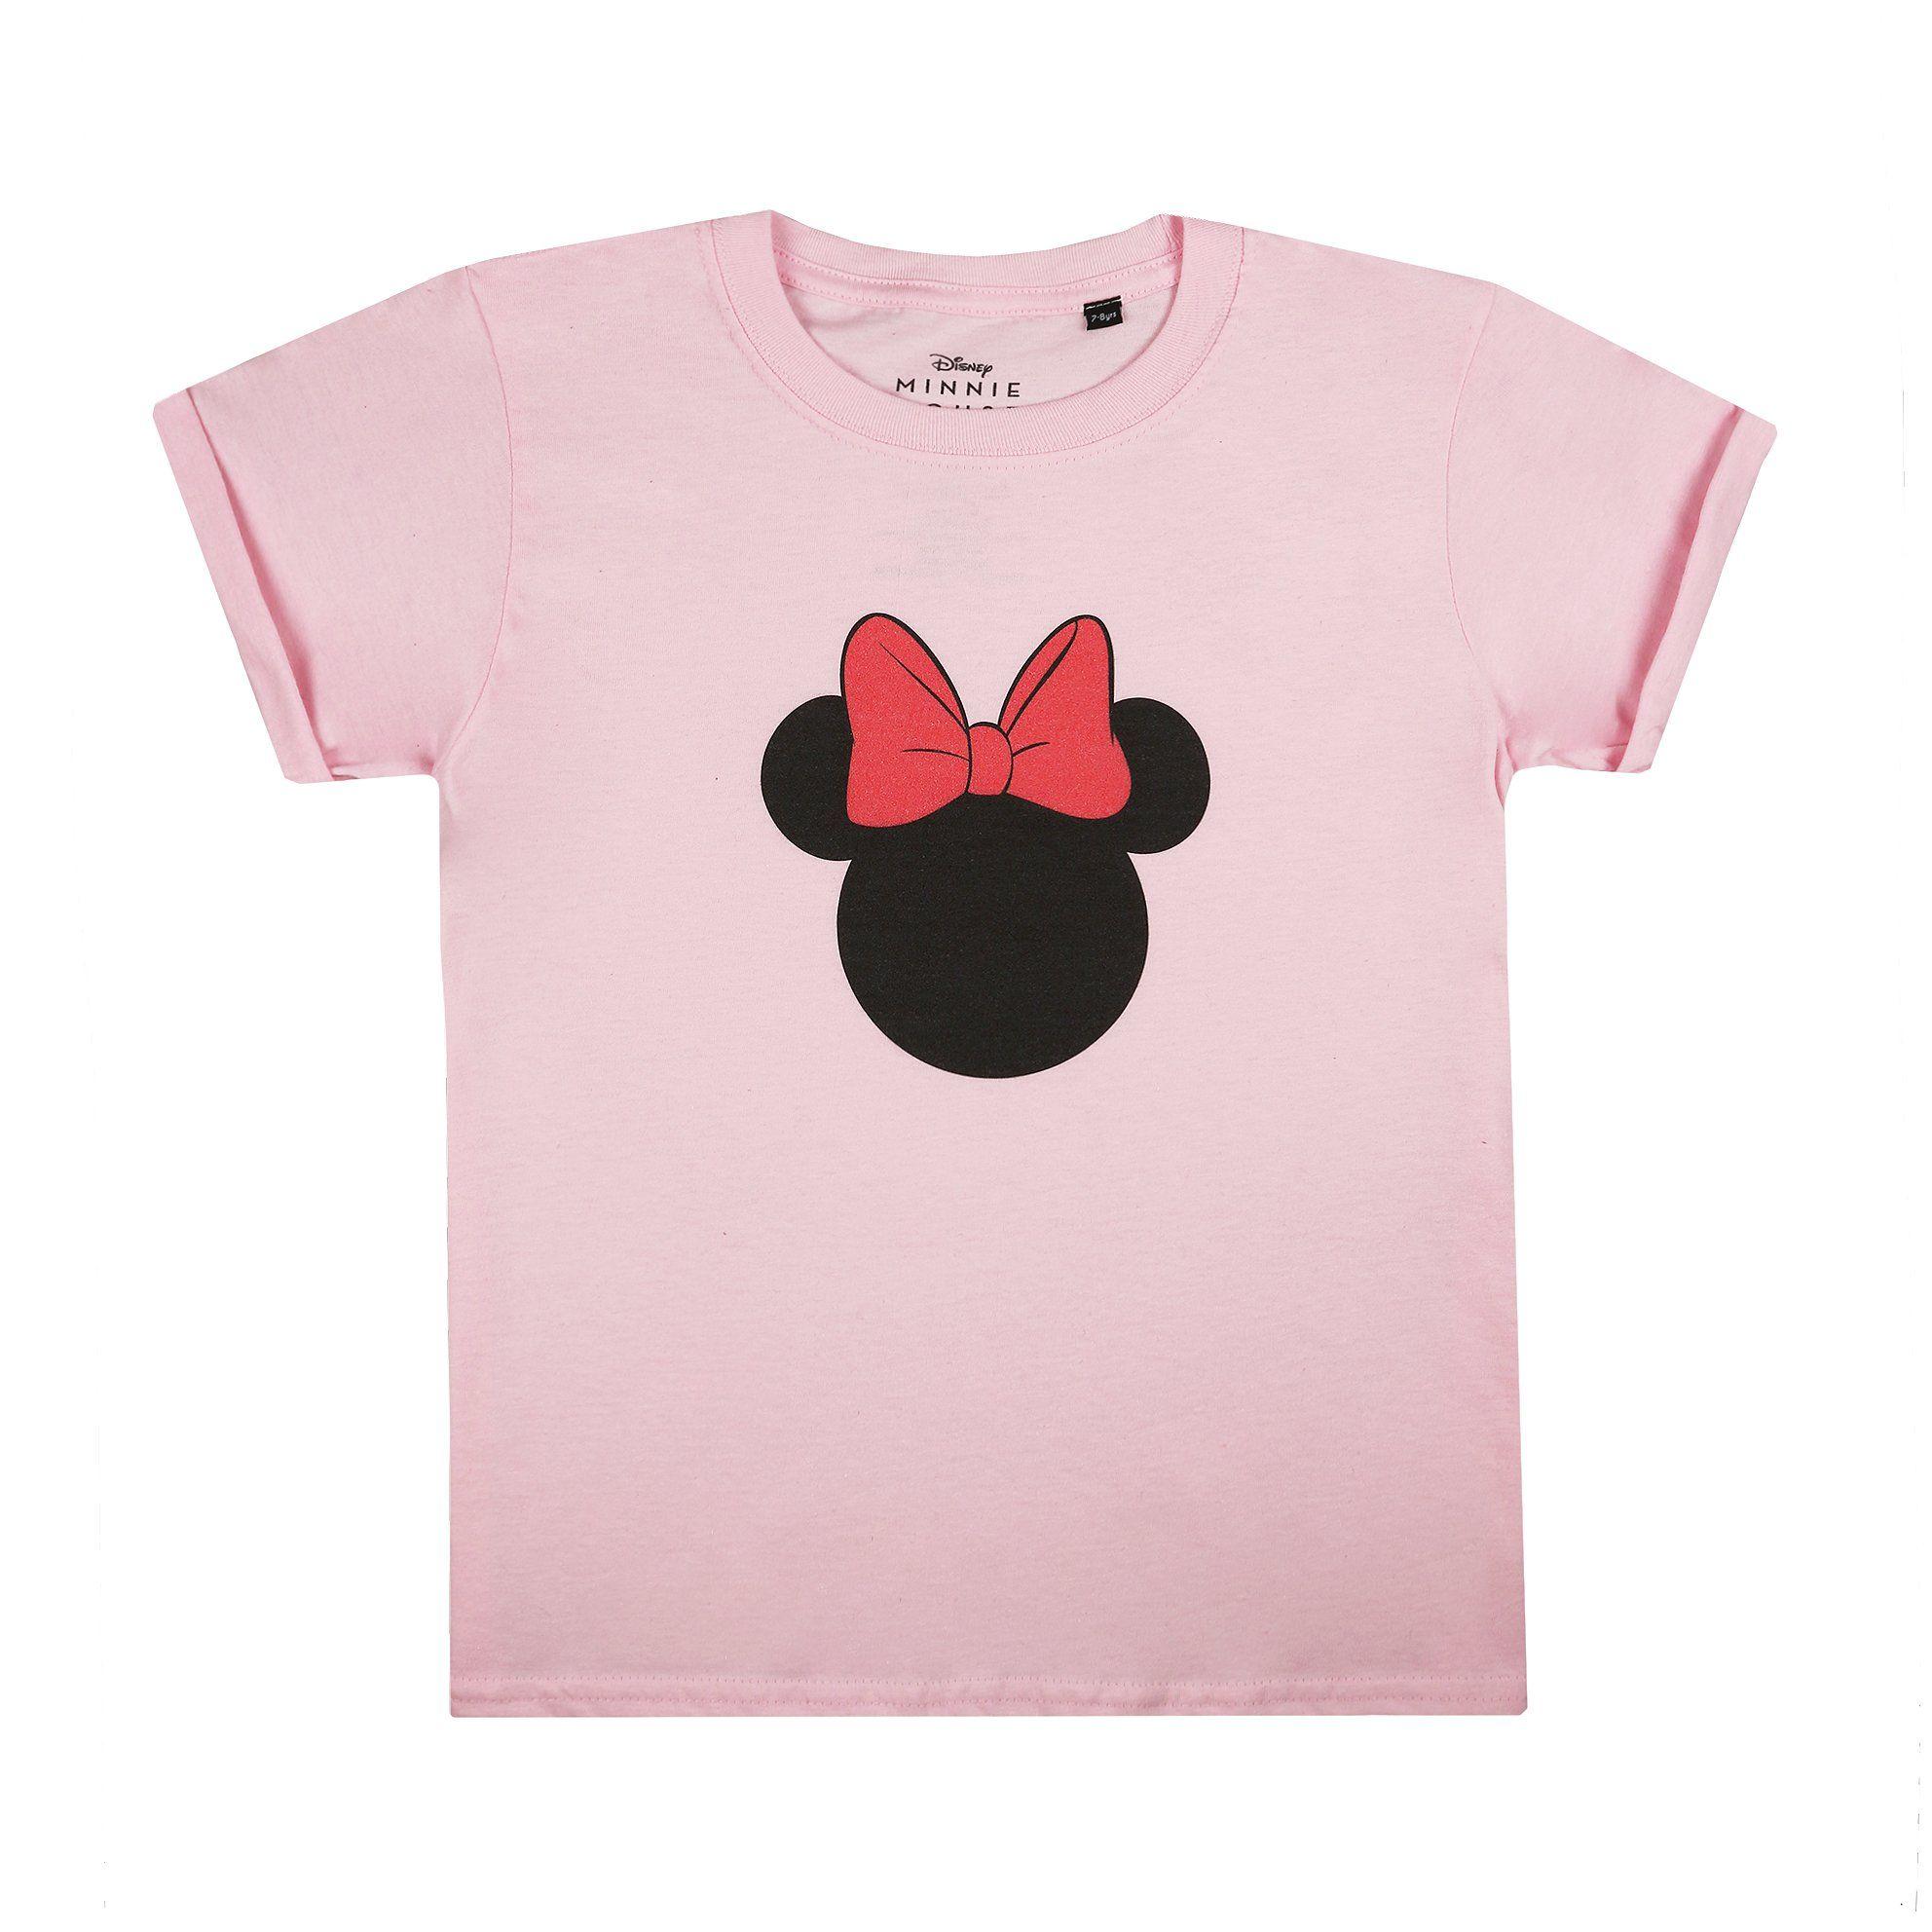 Disney Kids - Minnie Silhouette - T-Shirt - Light Pink